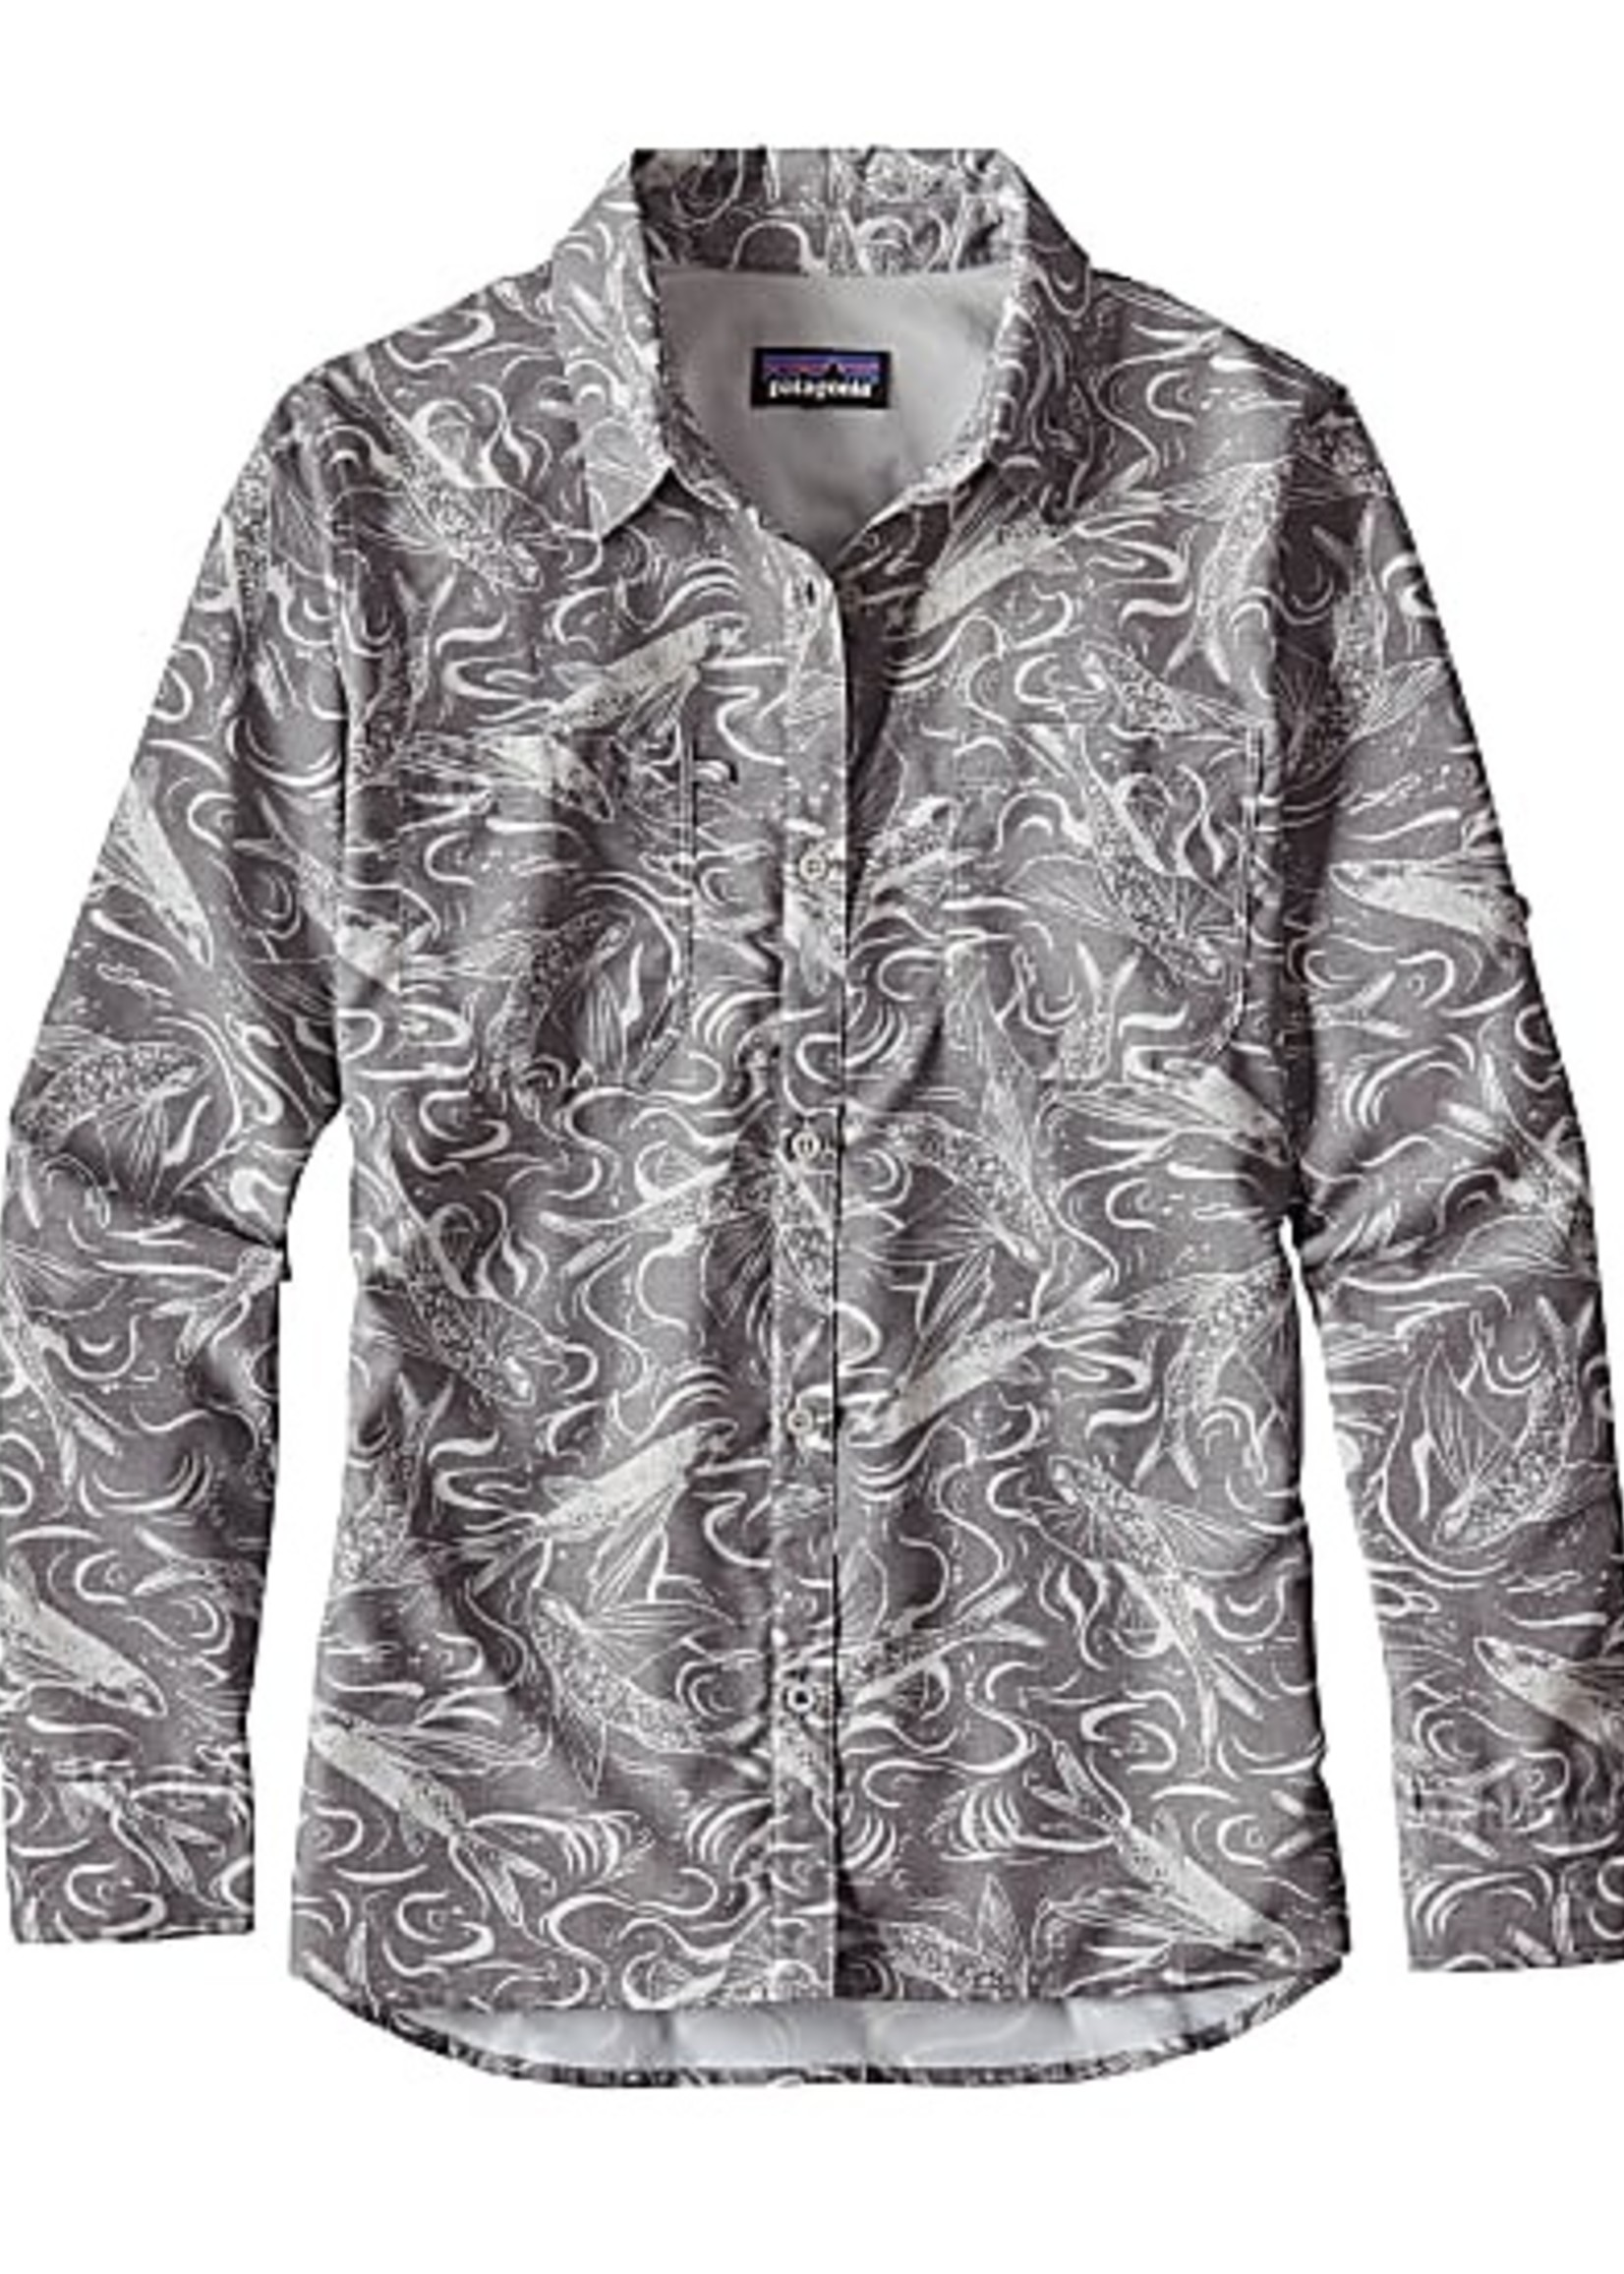 PATAGONIA W's L/S Sol Patrol Shirt fish splash: tailored Grey L